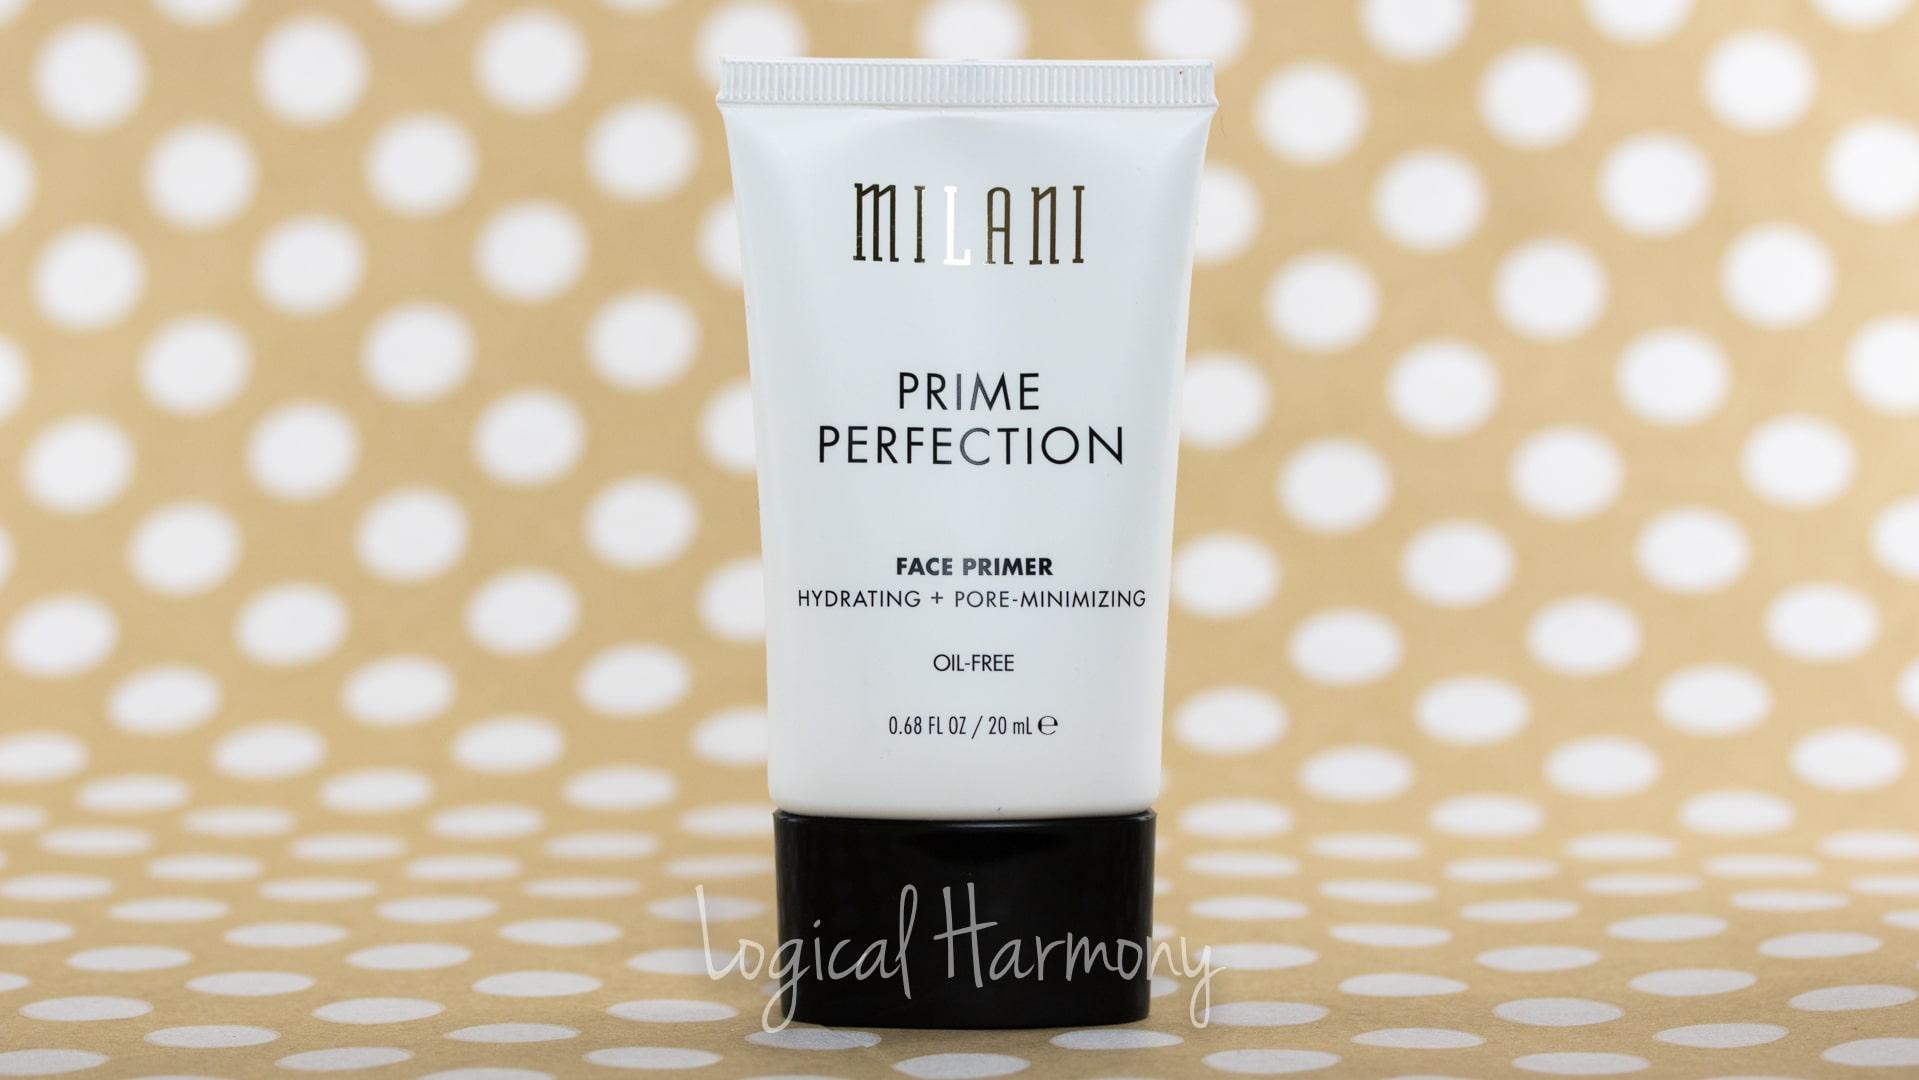 Milani Prime Perfection Hydrating + Pore-Minimizing Face Primer Review